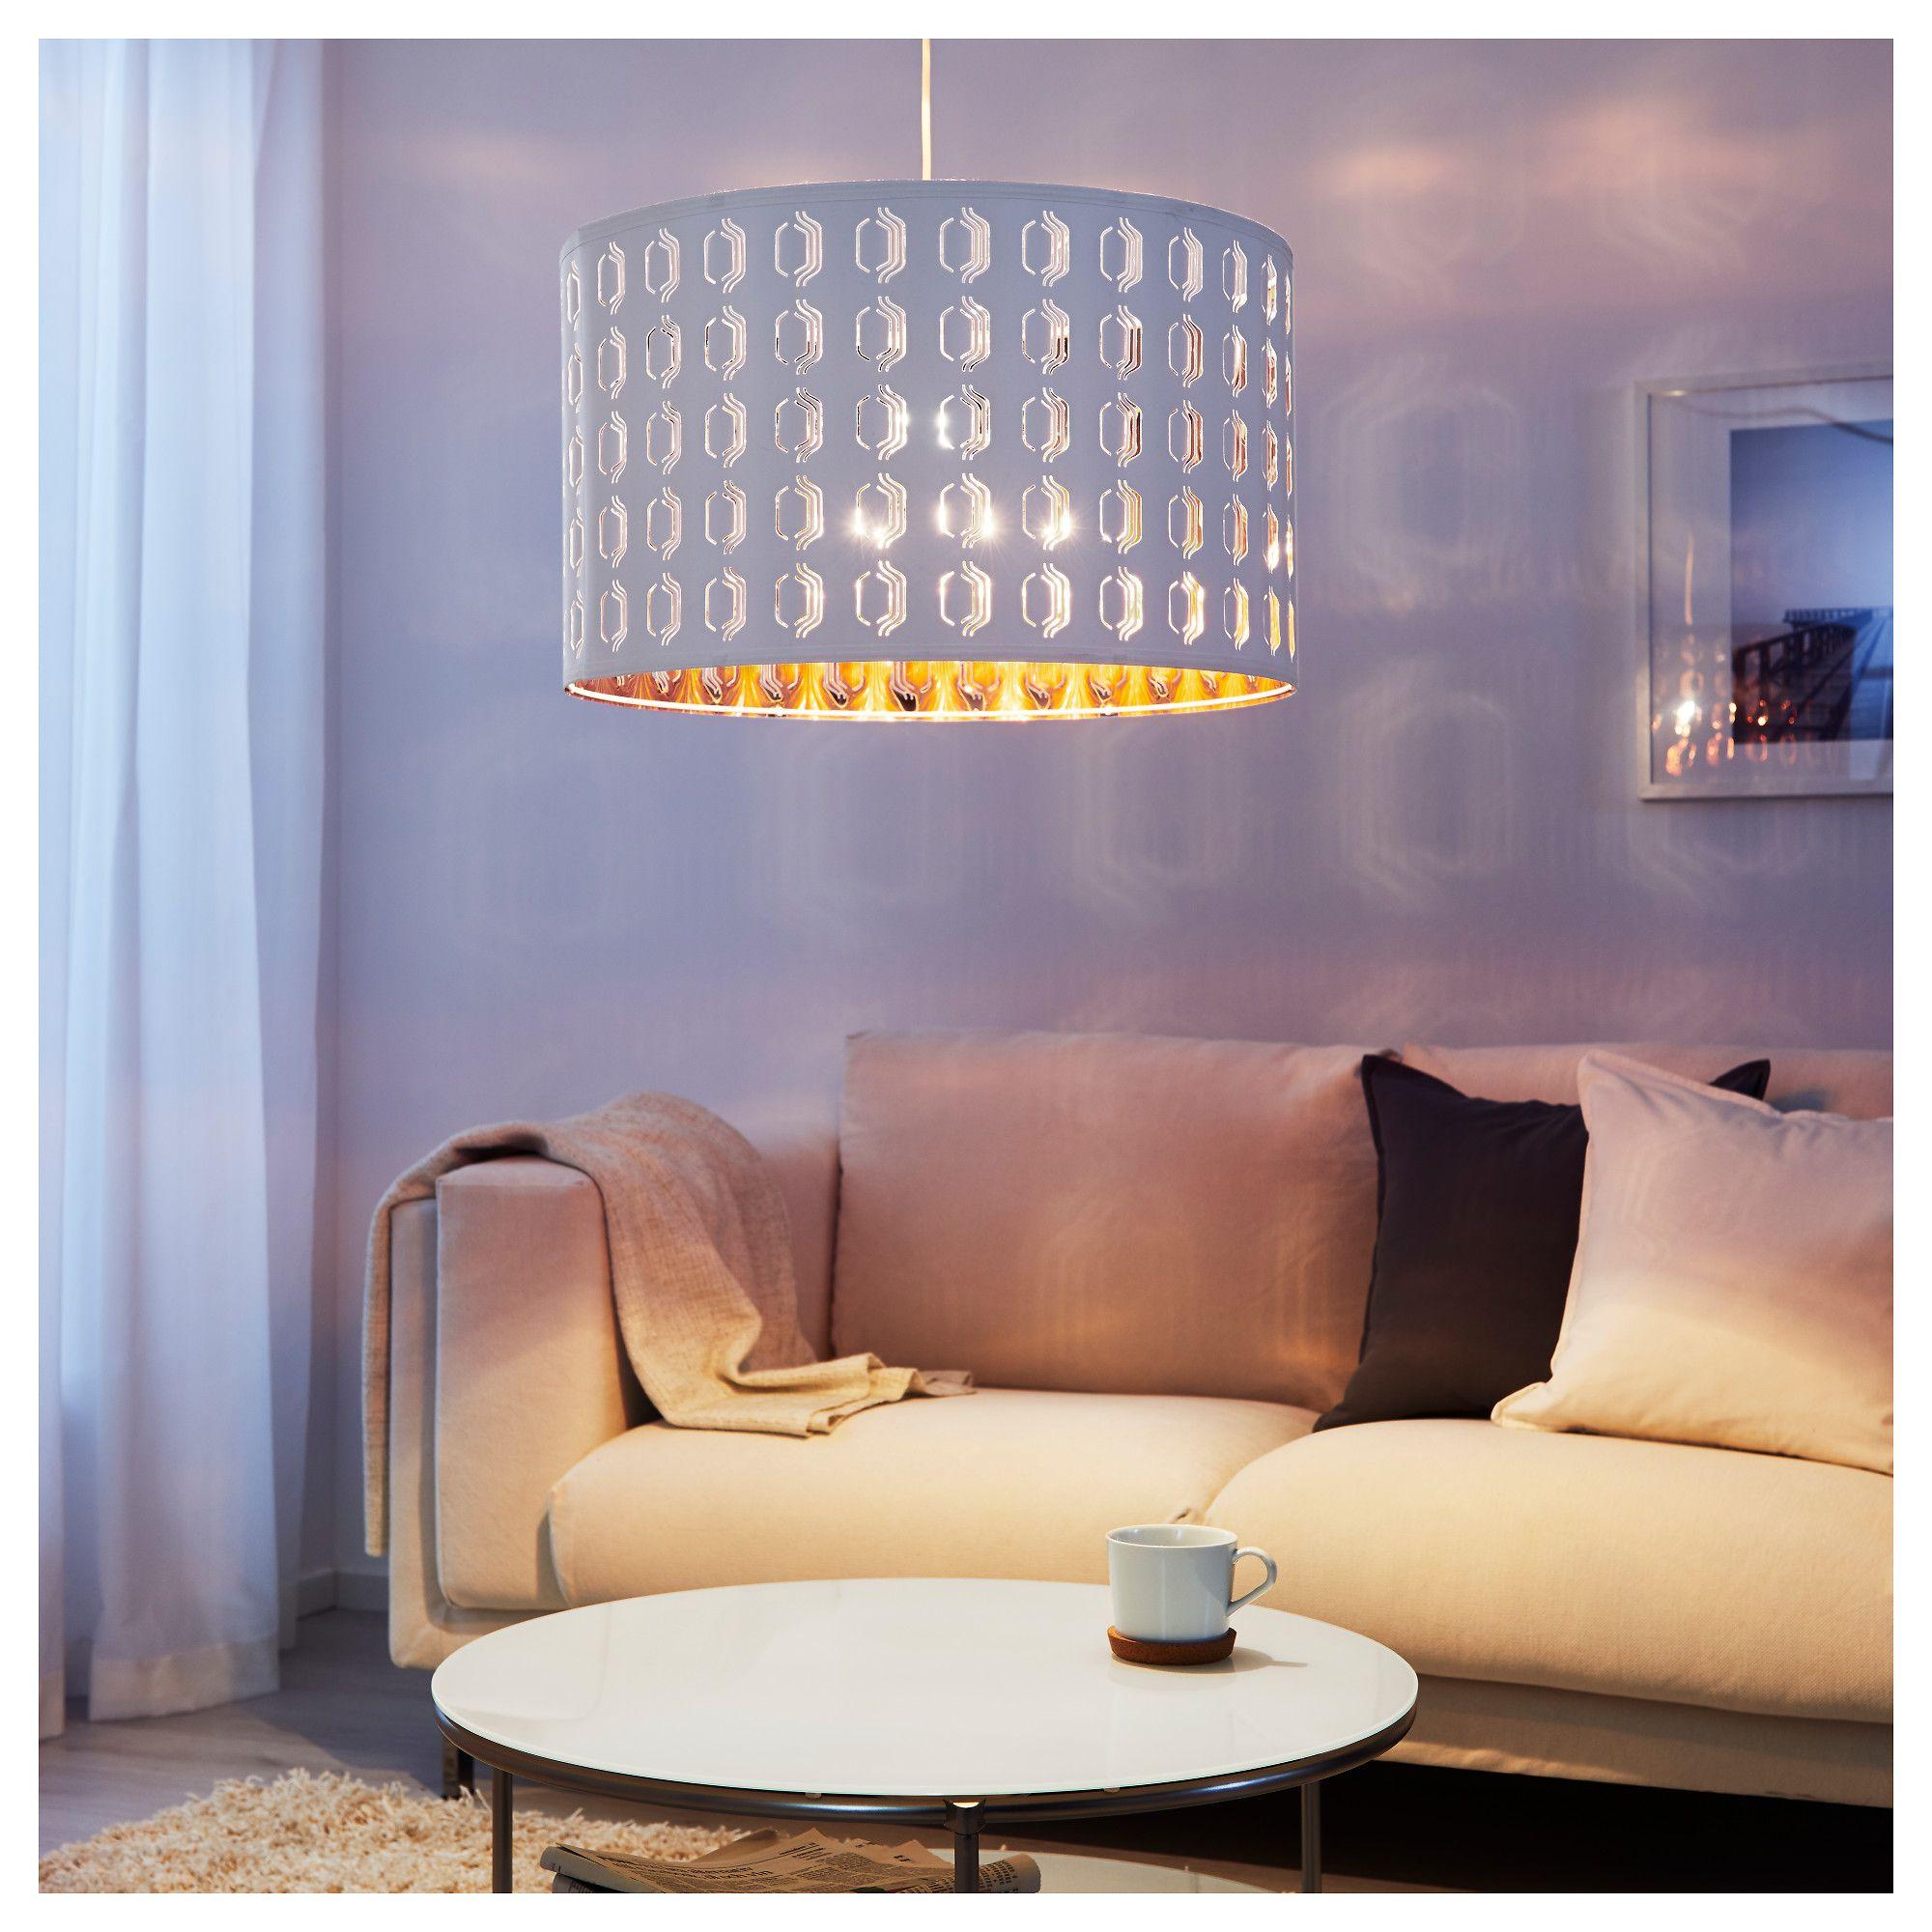 Ikea nym lamp shade home decorating ideas pinterest light ikea nym lamp shade ceiling aloadofball Choice Image